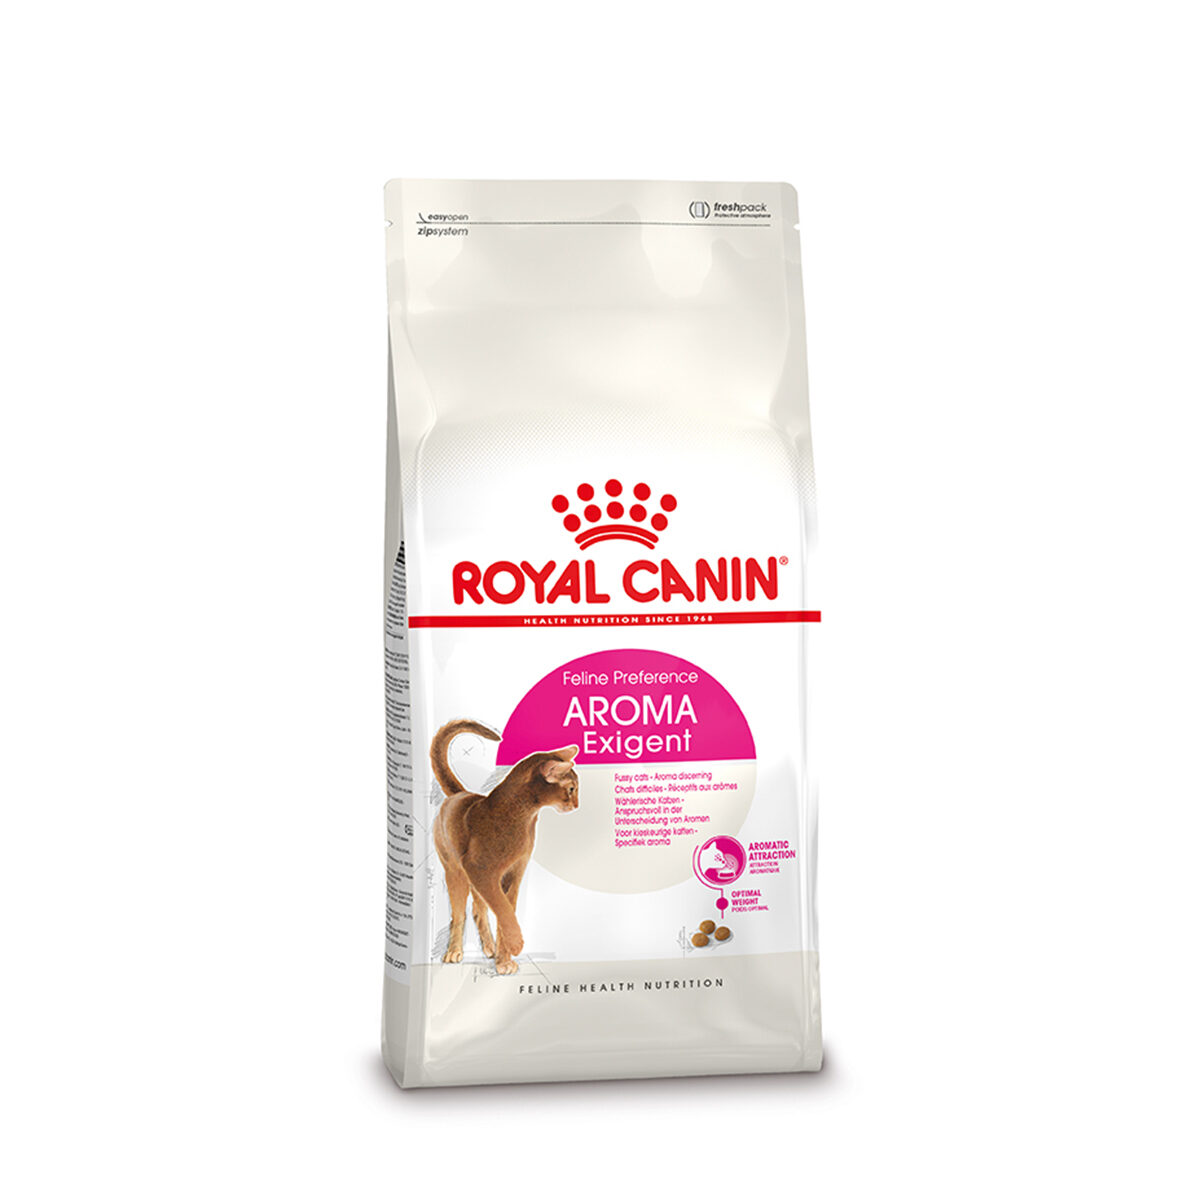 Royal Canin Aroma Exigent Kattenvoer 4 kg